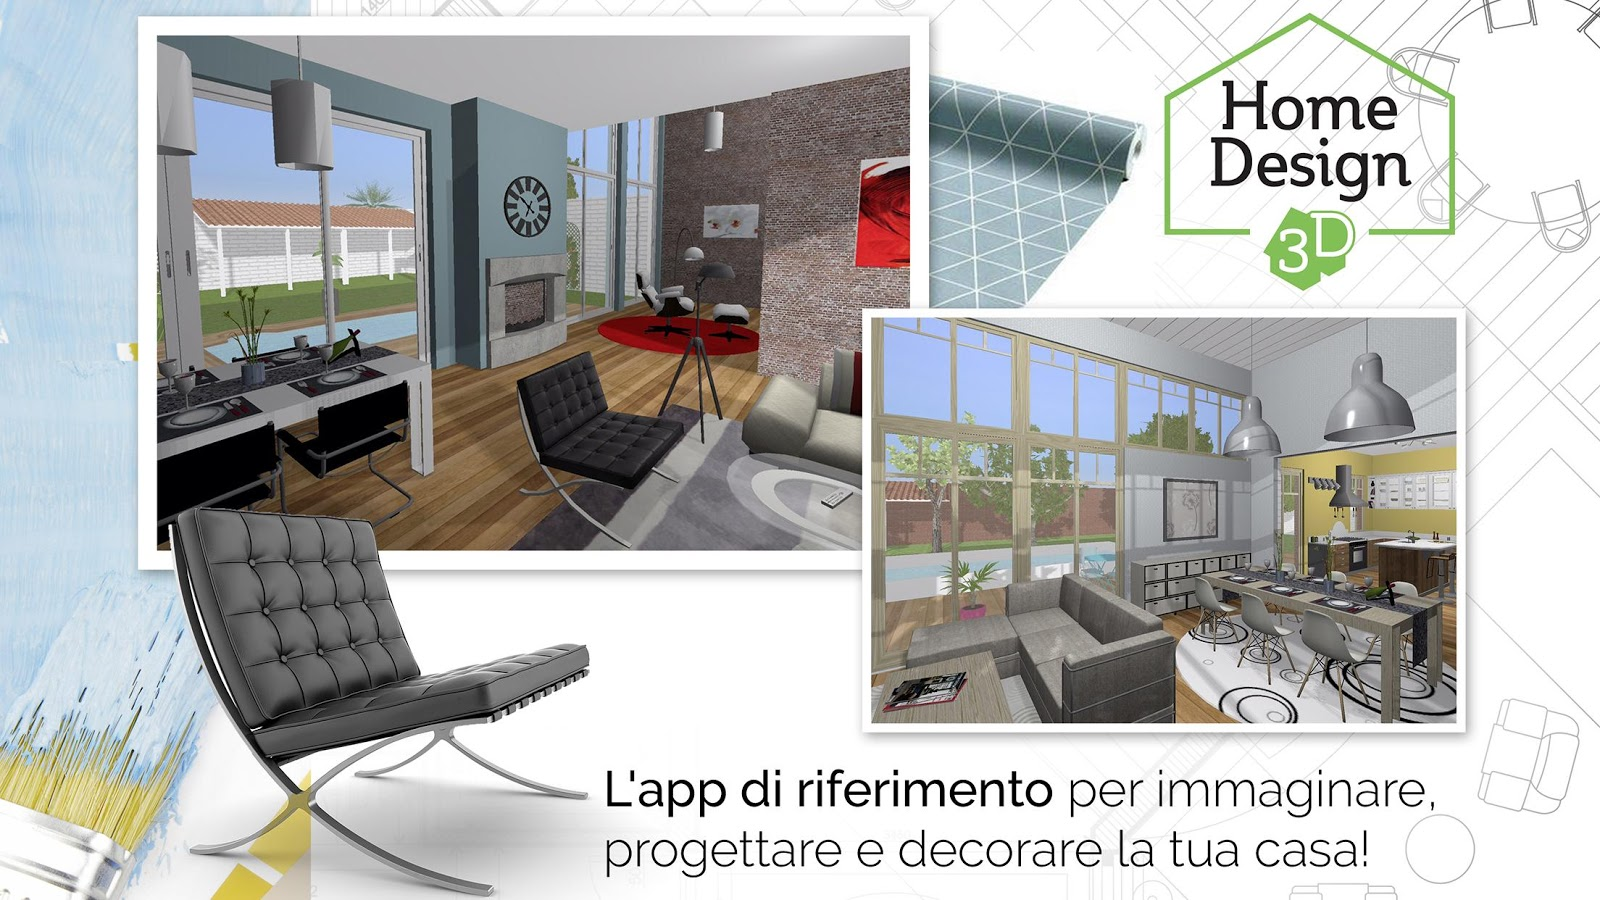 Home design 3d freemium app android su google play for App per progettare casa